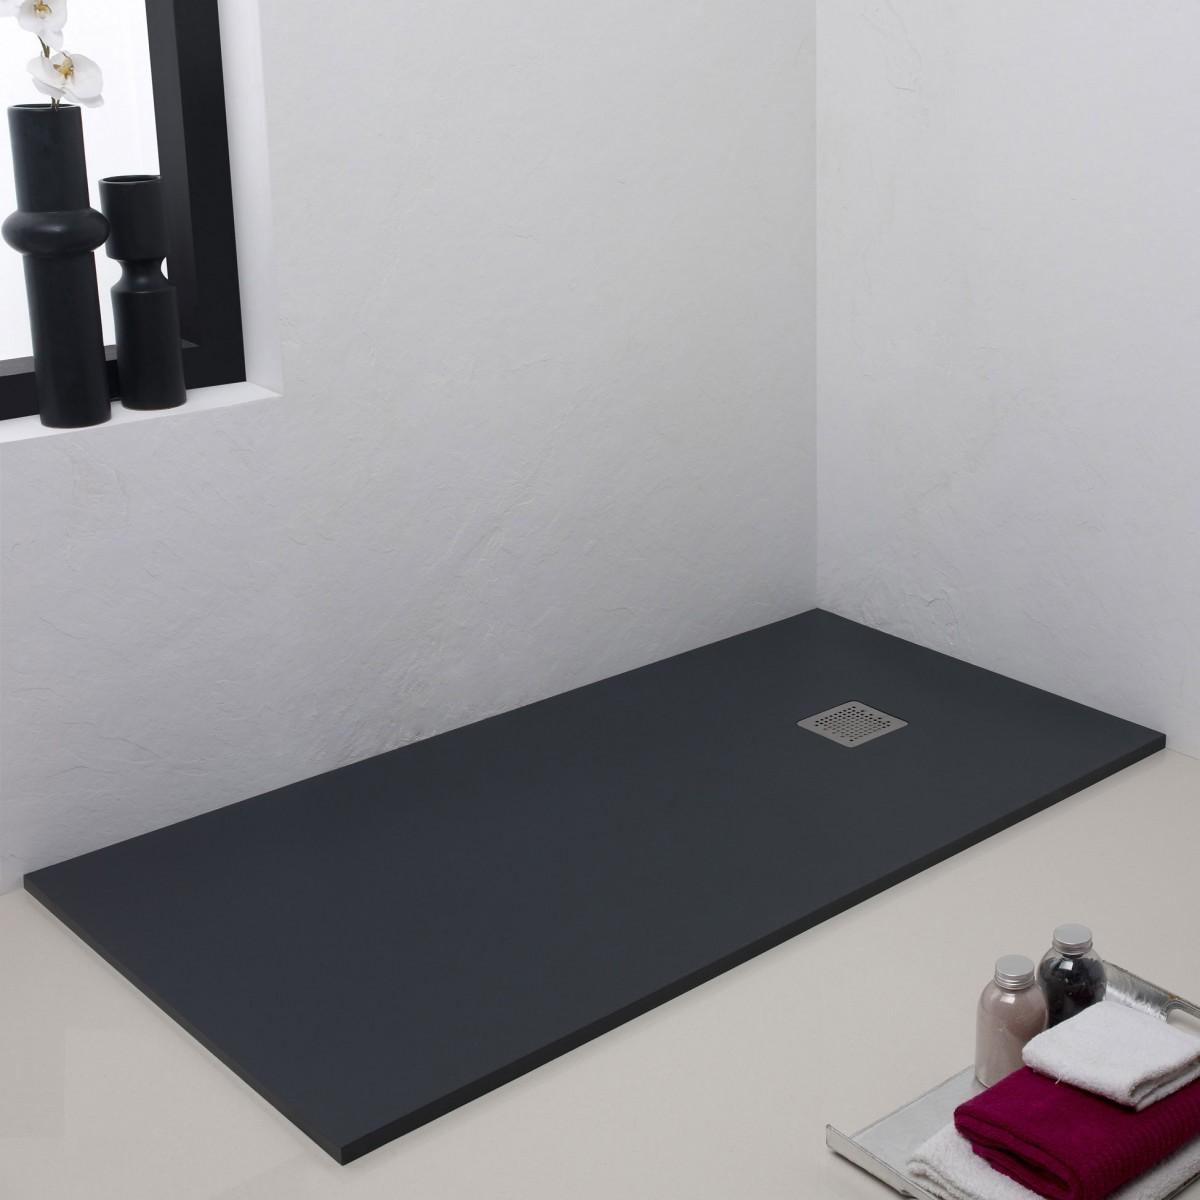 Plato de ducha a medida liso hidrotienda for Plato de ducha flexible